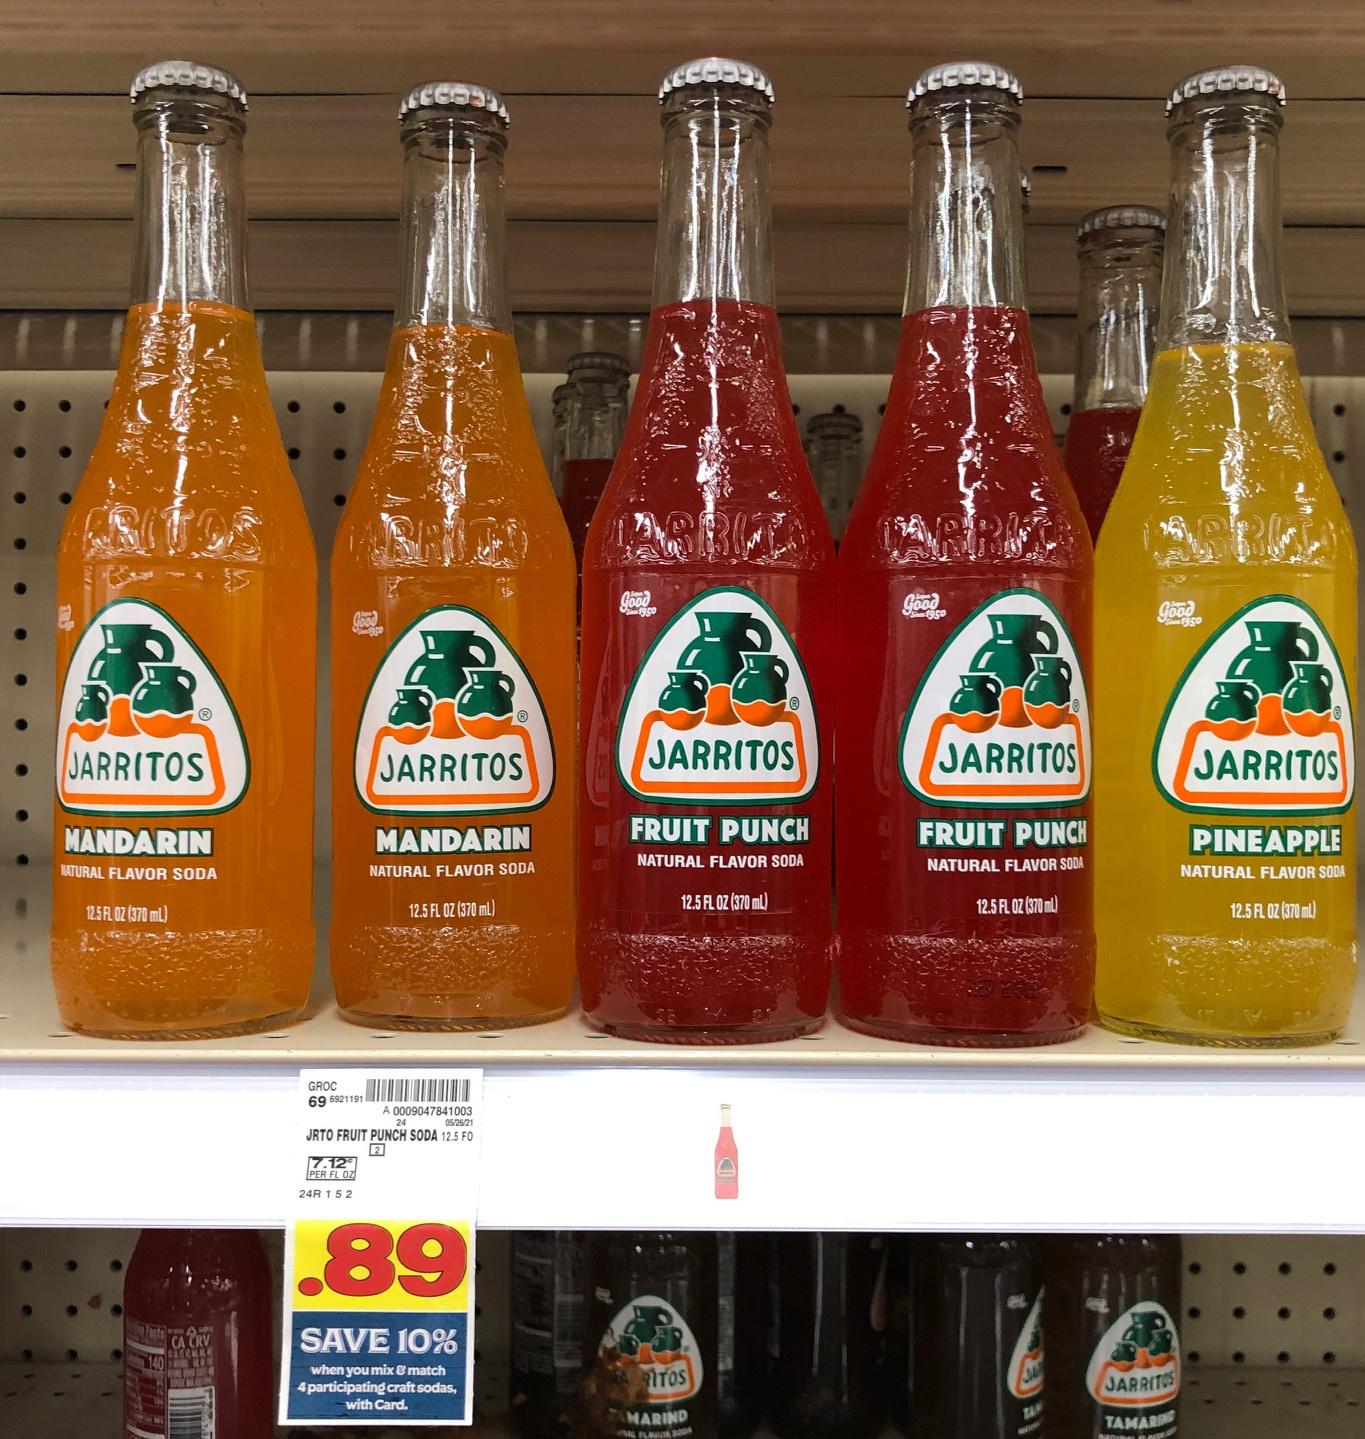 Get Jarritos Soda As Low As 64¢ At Kroger